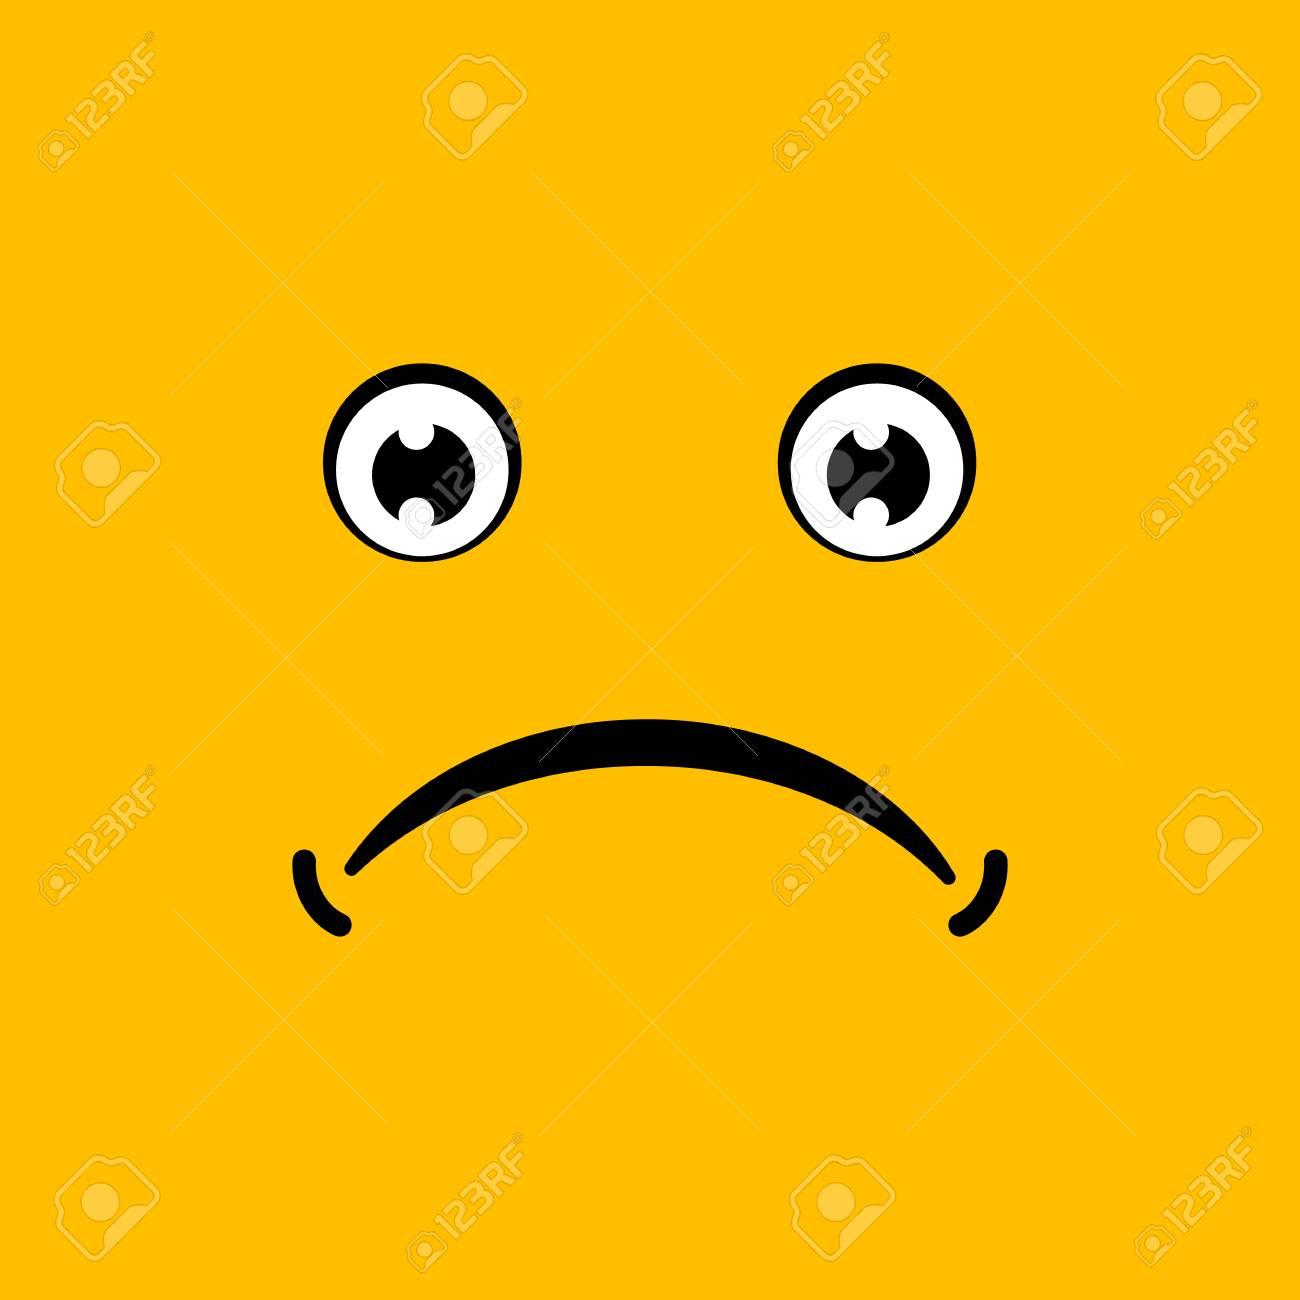 Yellow emoticon face, sad, vector illustration - 94158229